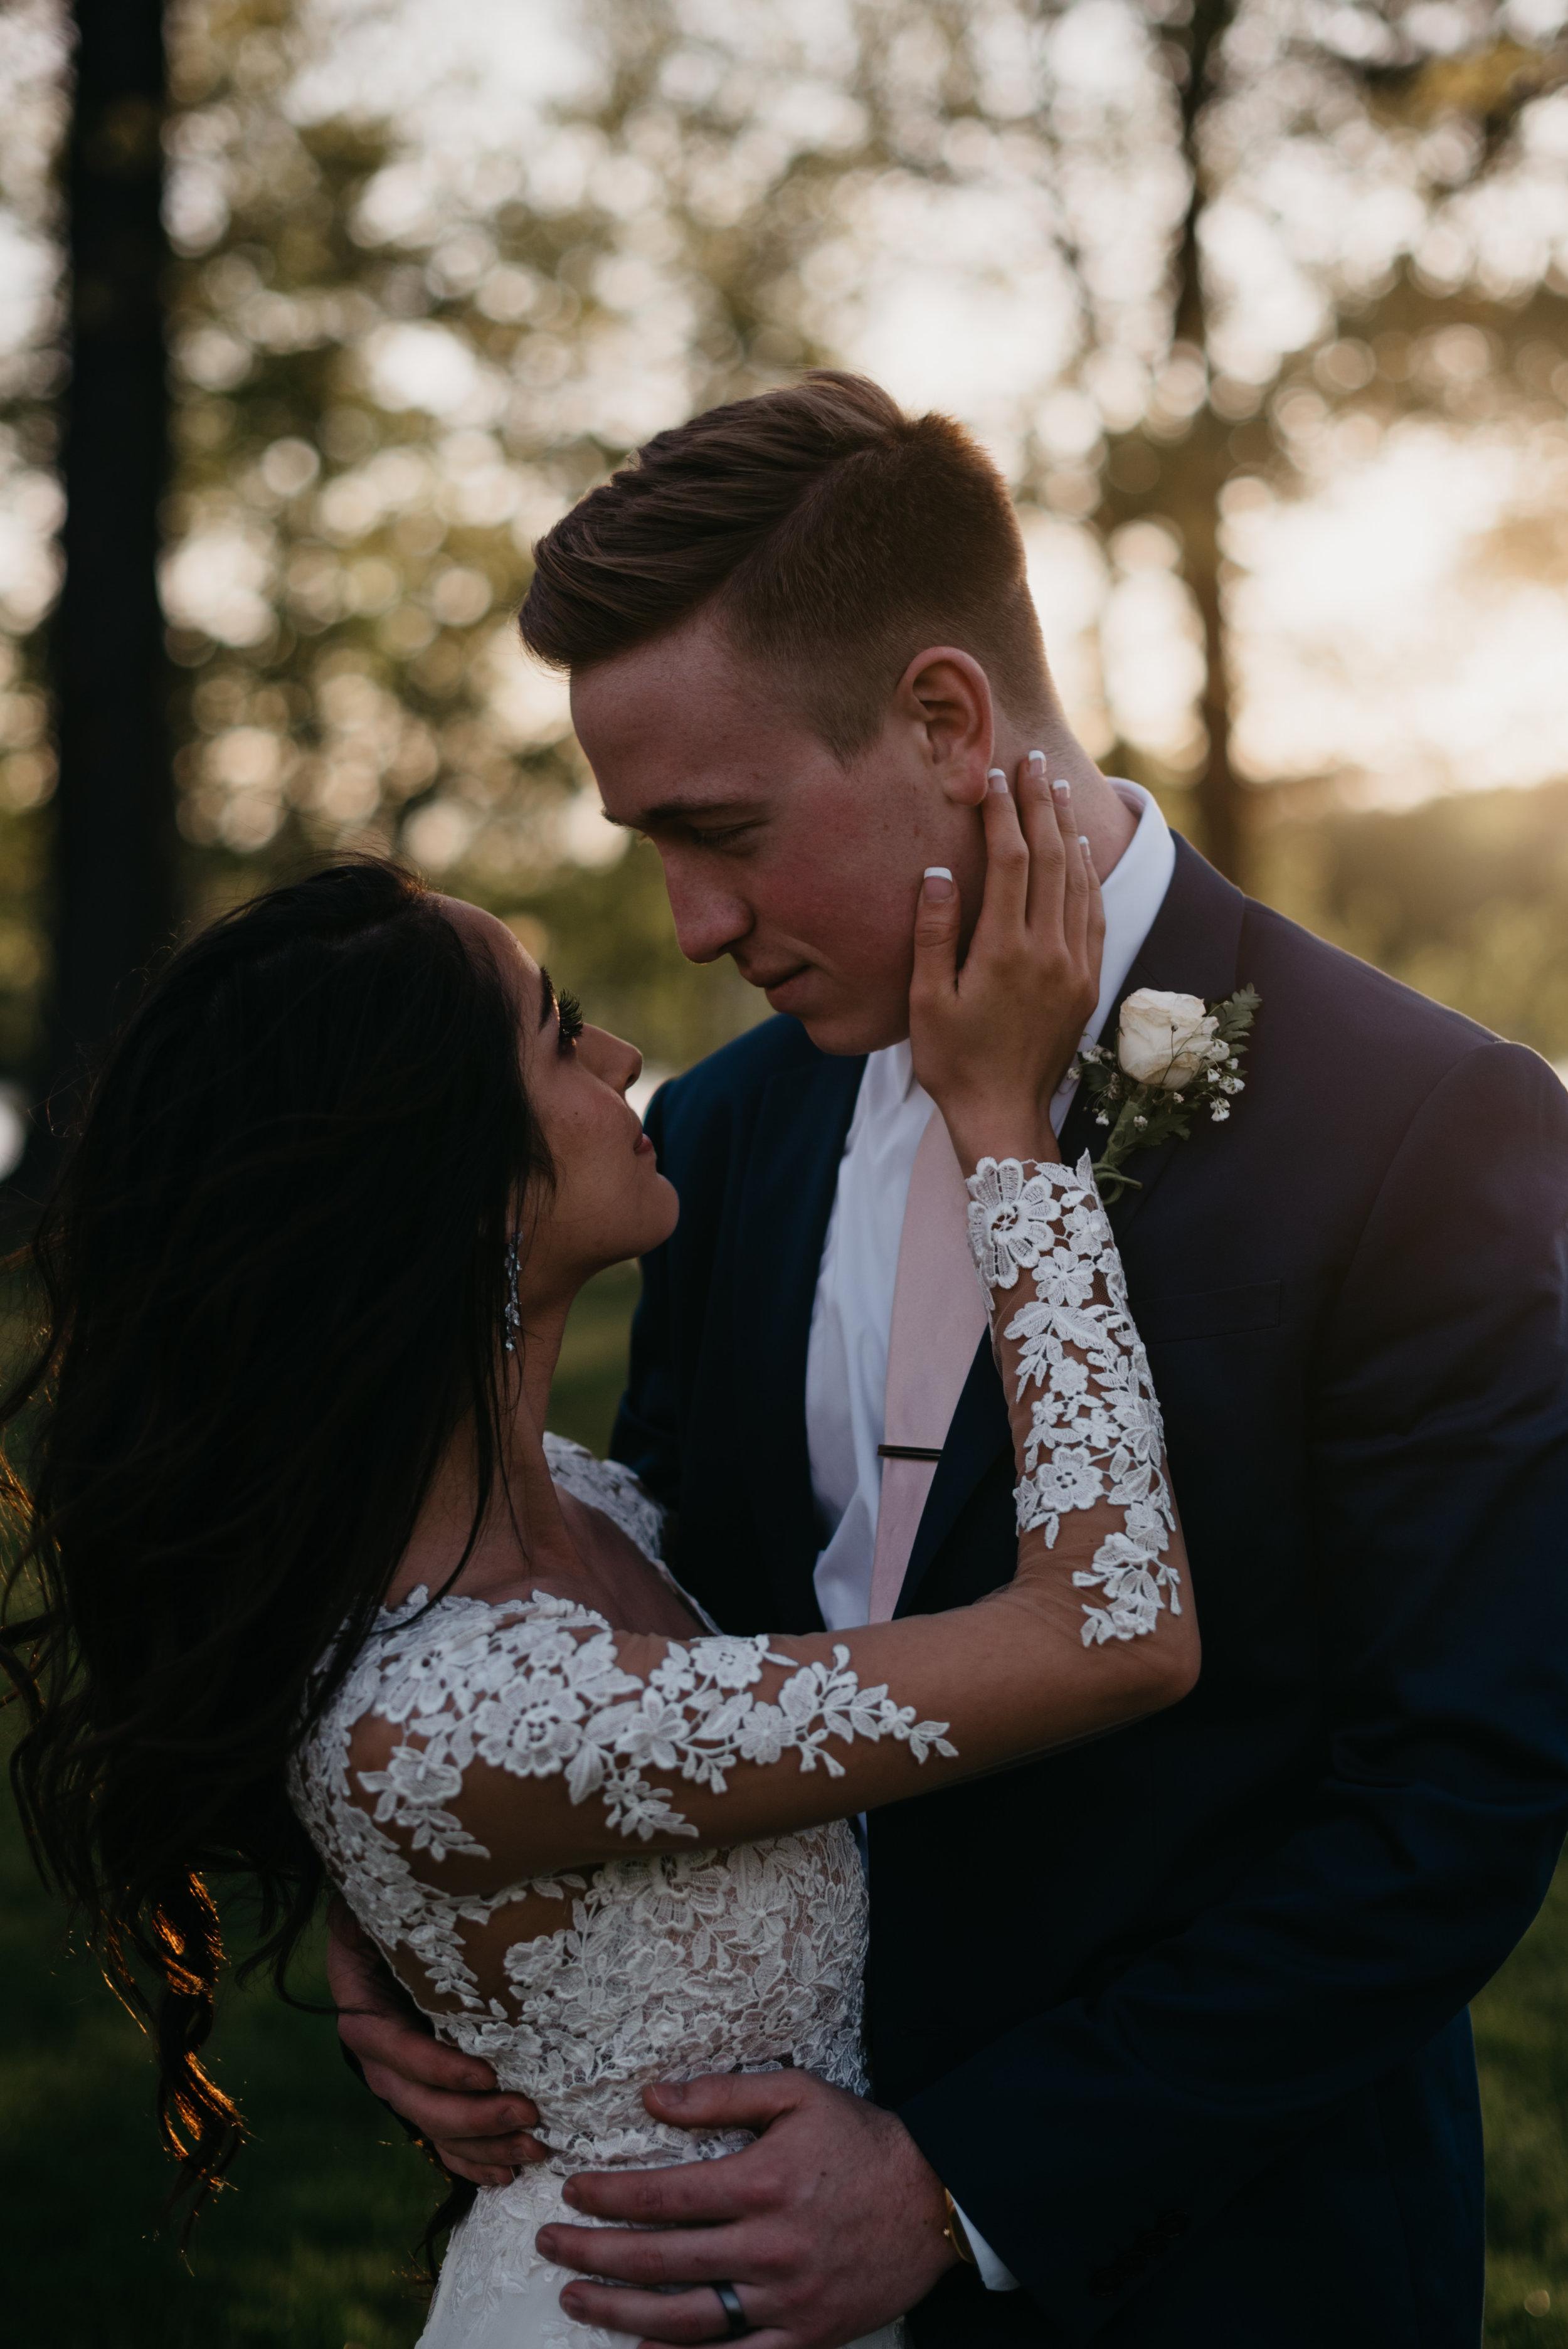 Barch-Massachusetts-Lakeside Tent Wedding-Western Massachusetts Wedding Photographer-03305.jpg